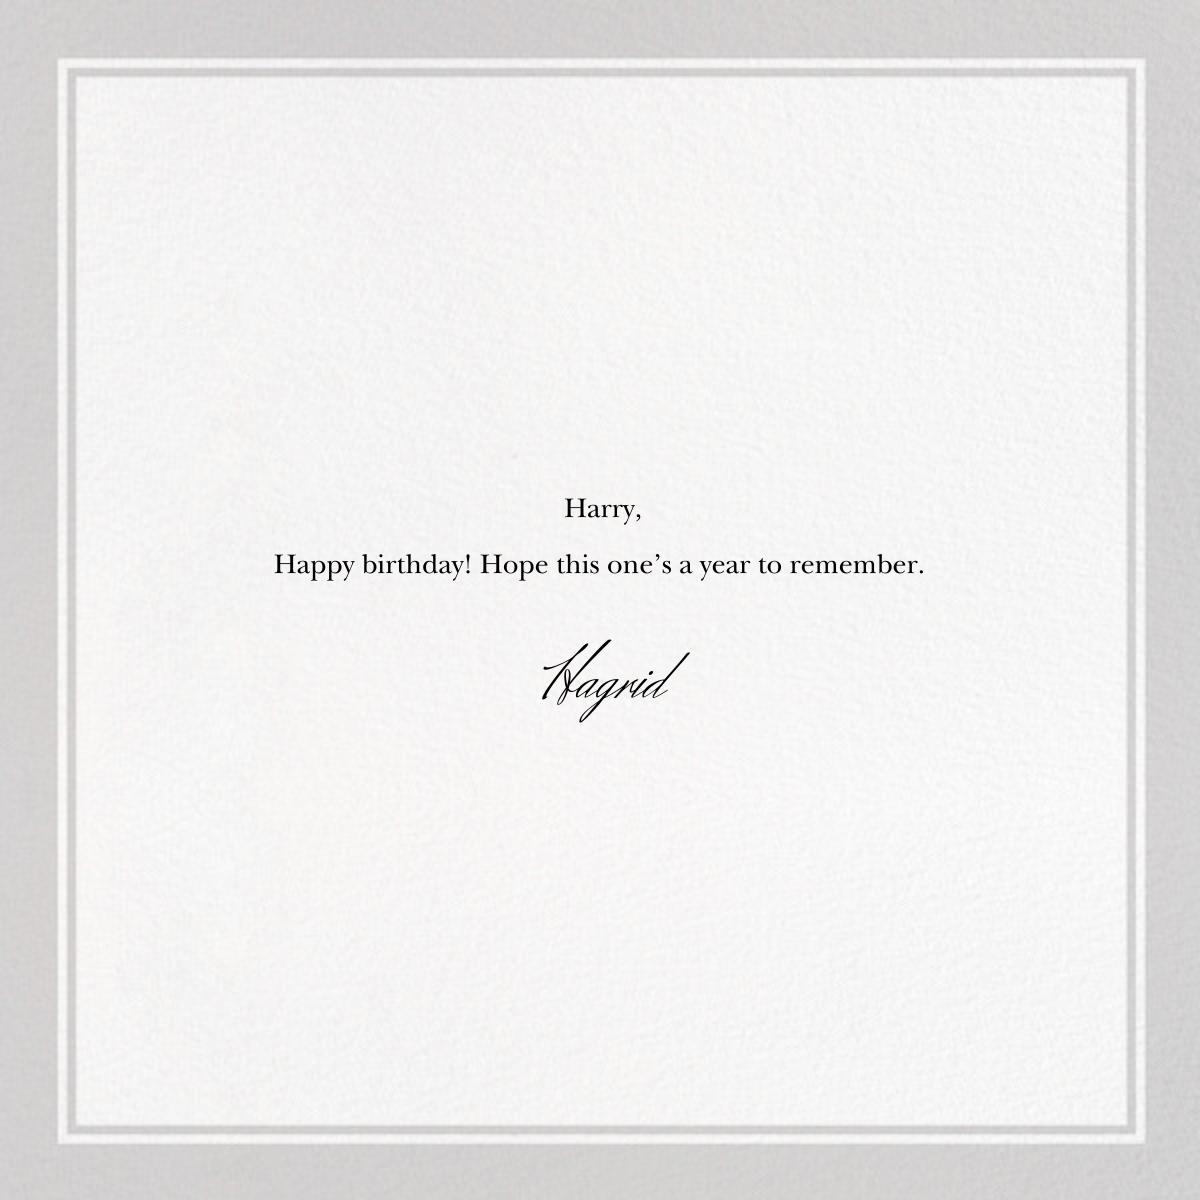 Generation Gap - The New Yorker - Funny birthday eCards - card back